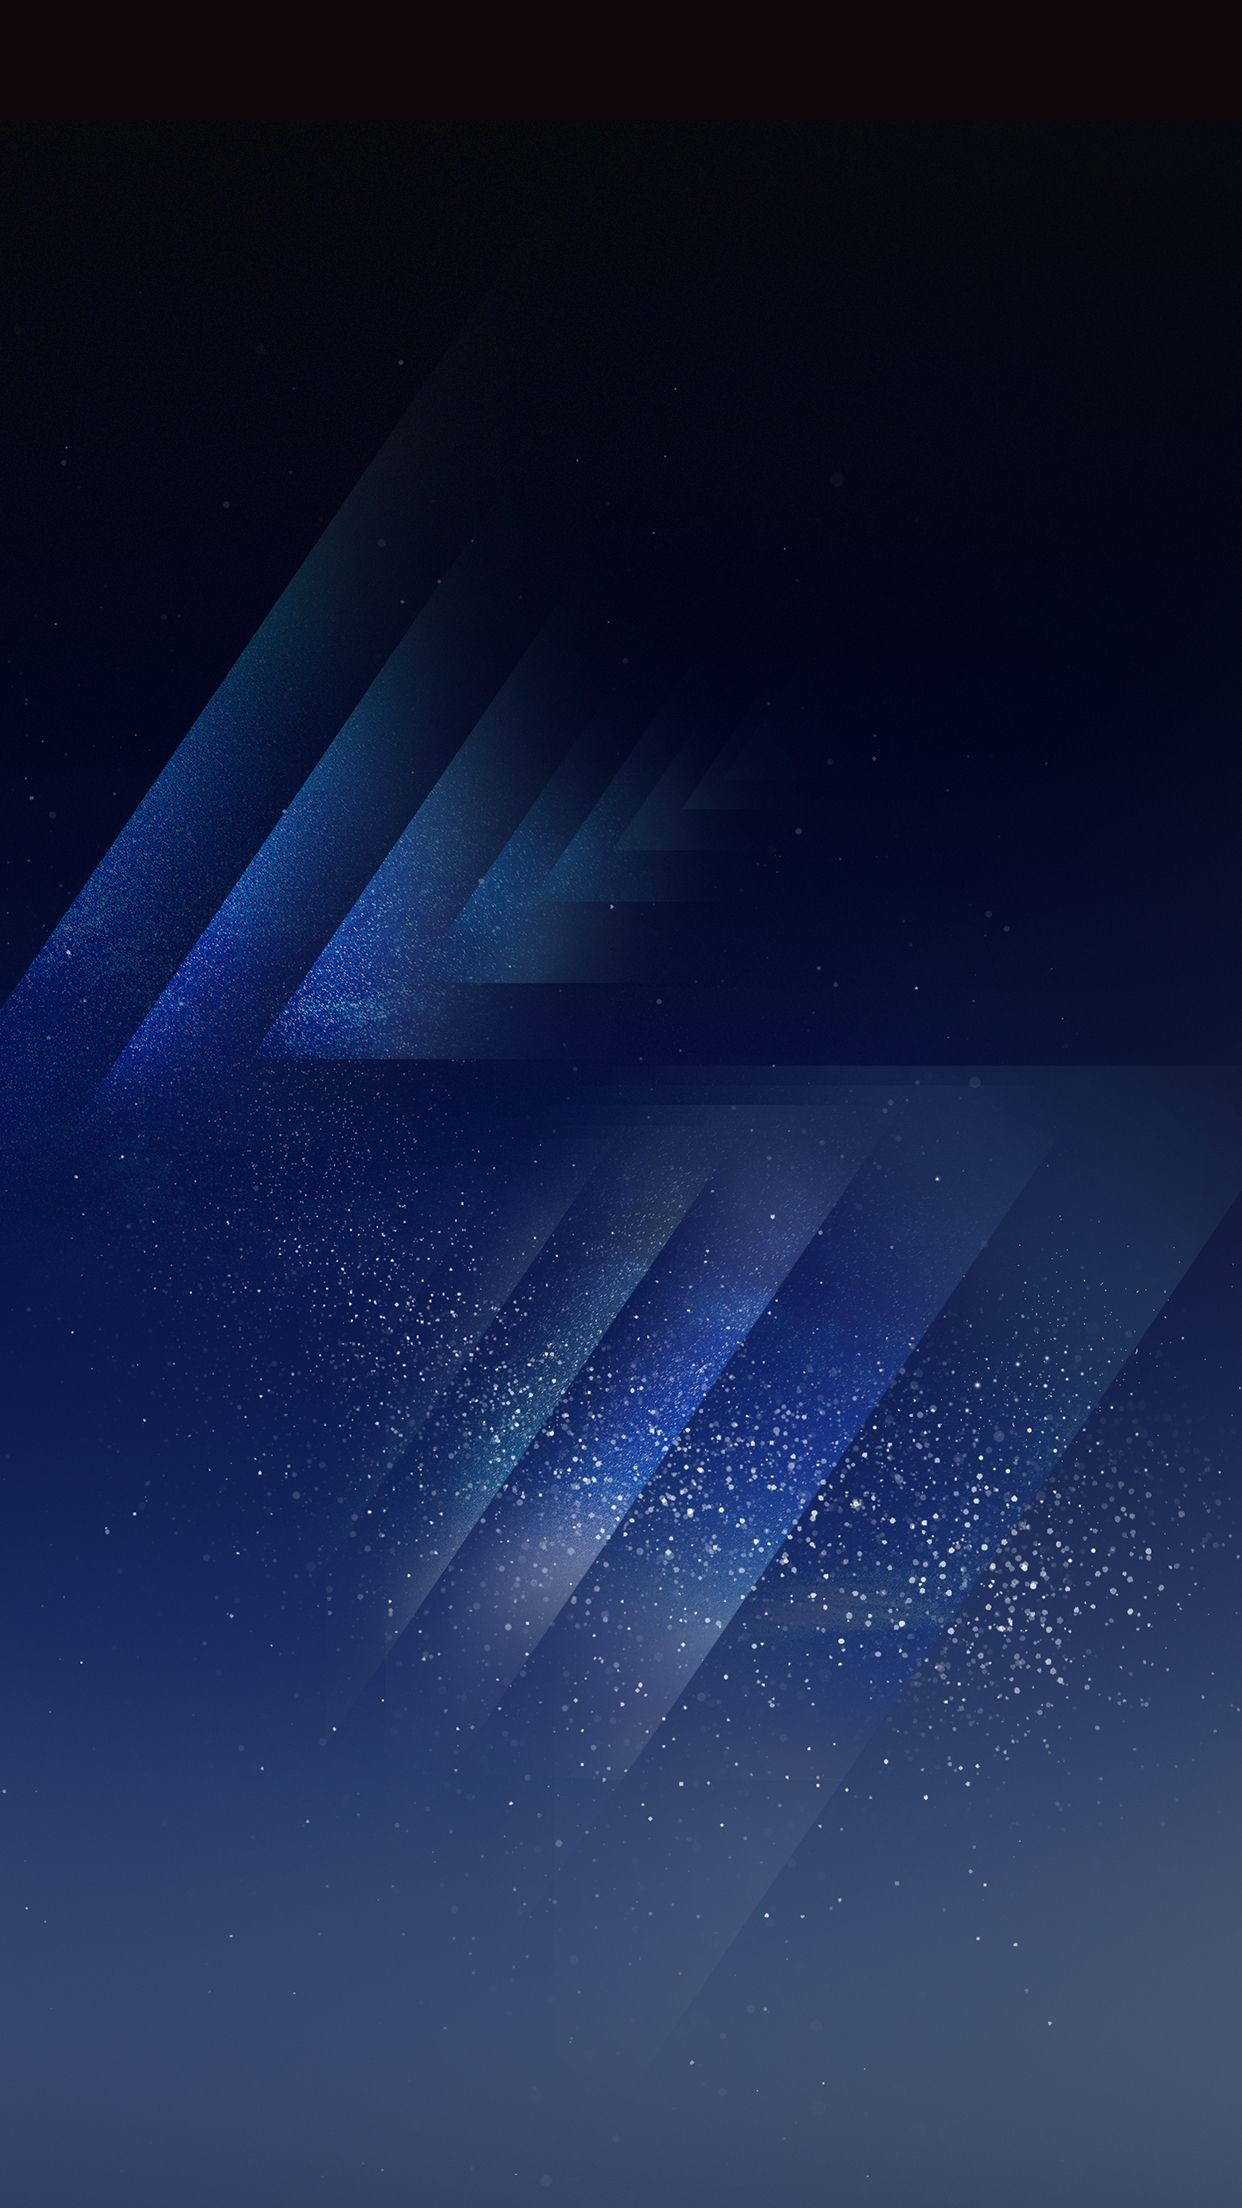 Res: 1242x2208, Blue, wallpaper, galaxy, tranquil, beauty, peaceful, calming, night sky,  abstract, stars, digital art, s8, walls